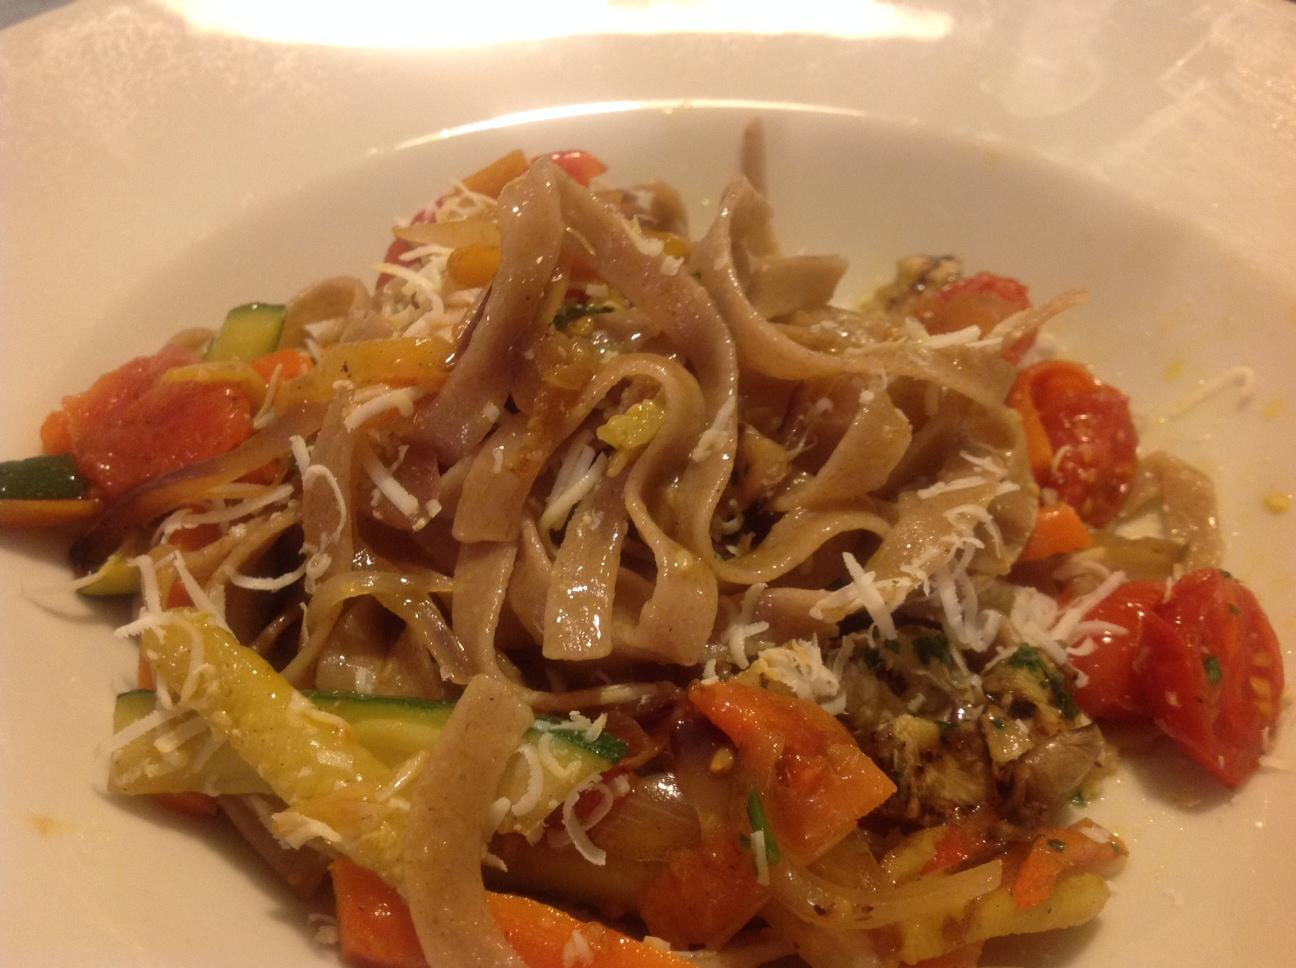 Vollkorn-Tagliatelle aus Tumminia Weizen La Fastuchera mit Gemüse